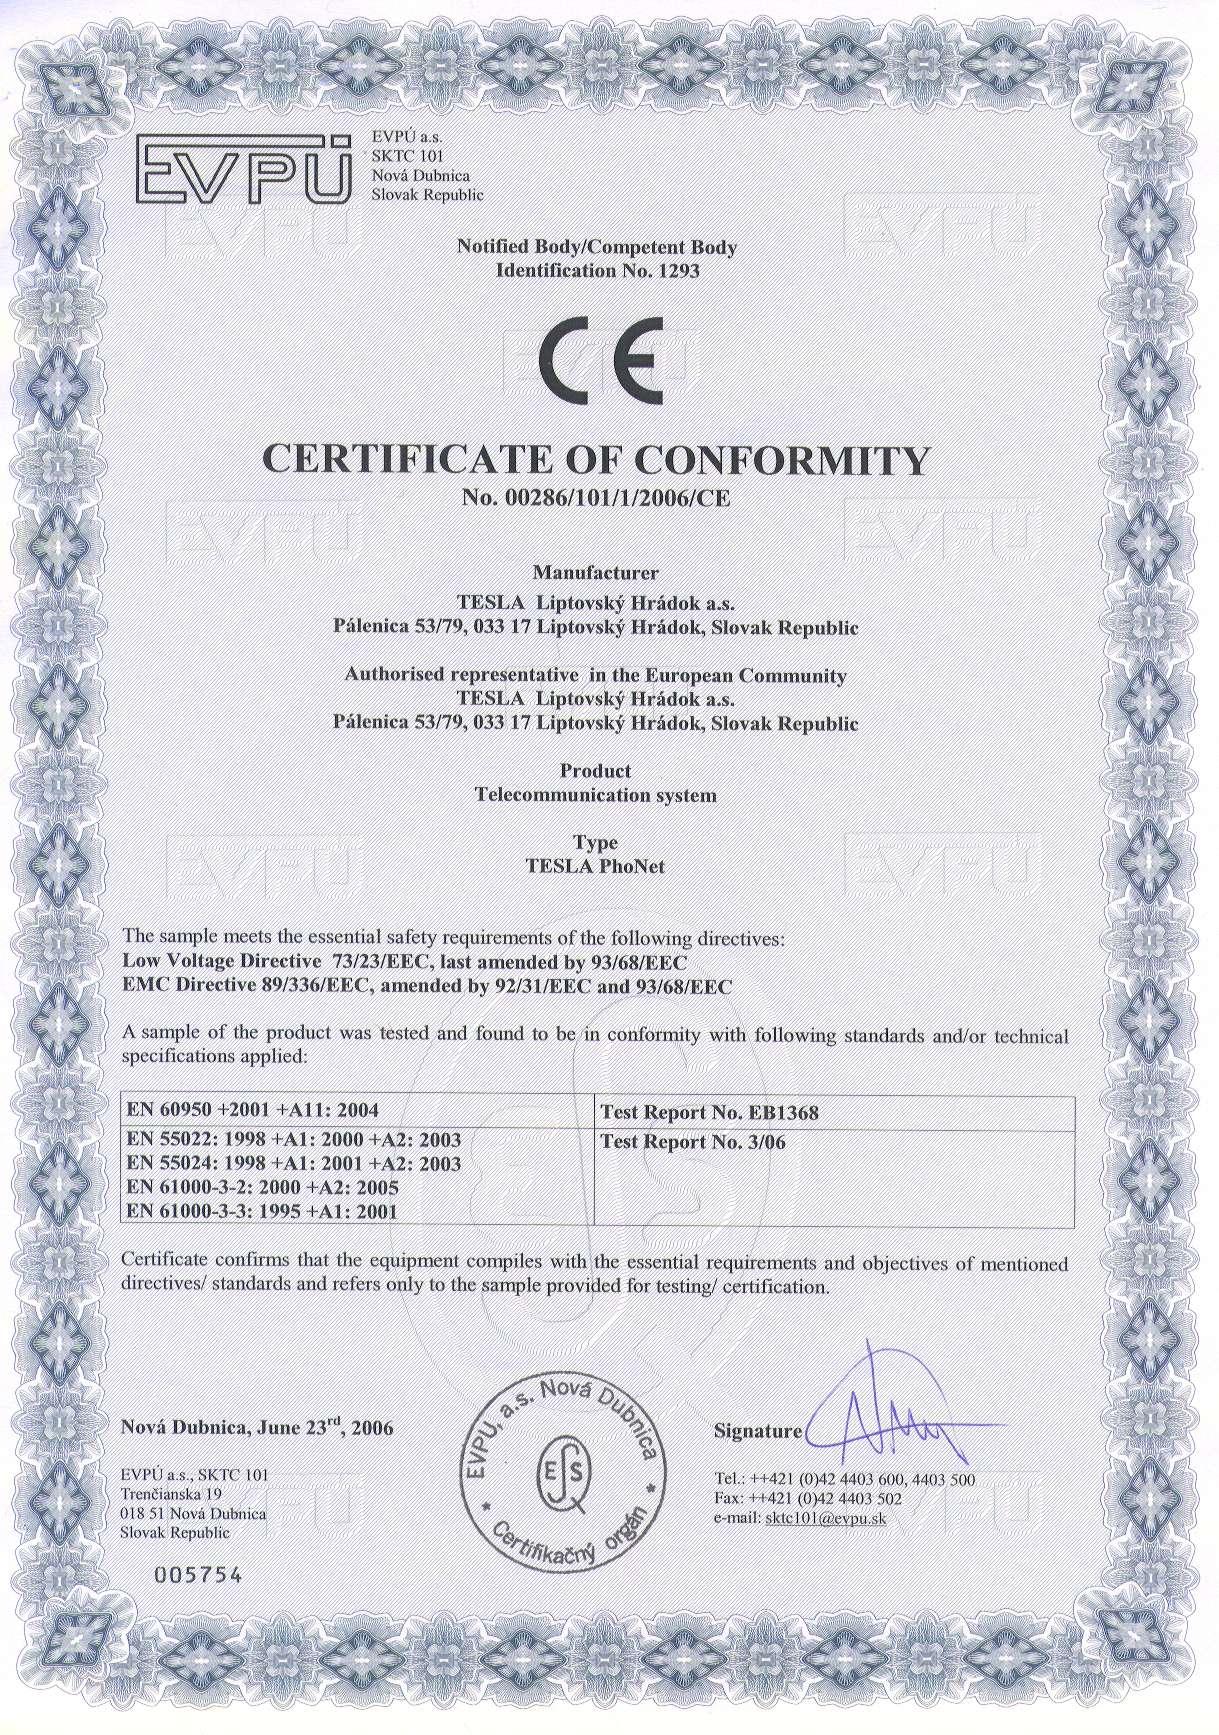 certificate of manufacture template - certificate of manufacture template search results for